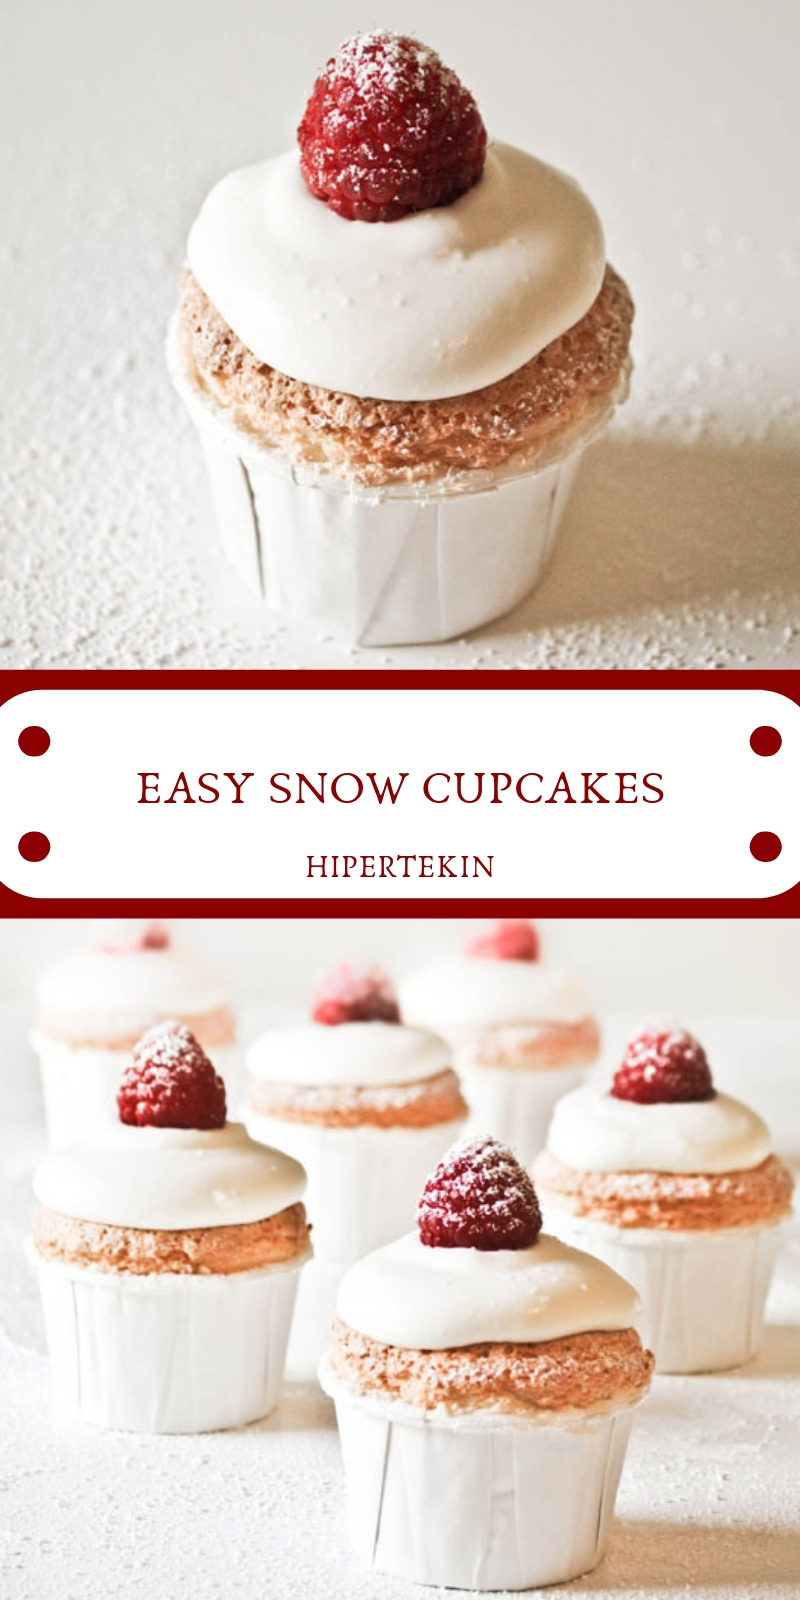 EASY SNOW CUPCAKES